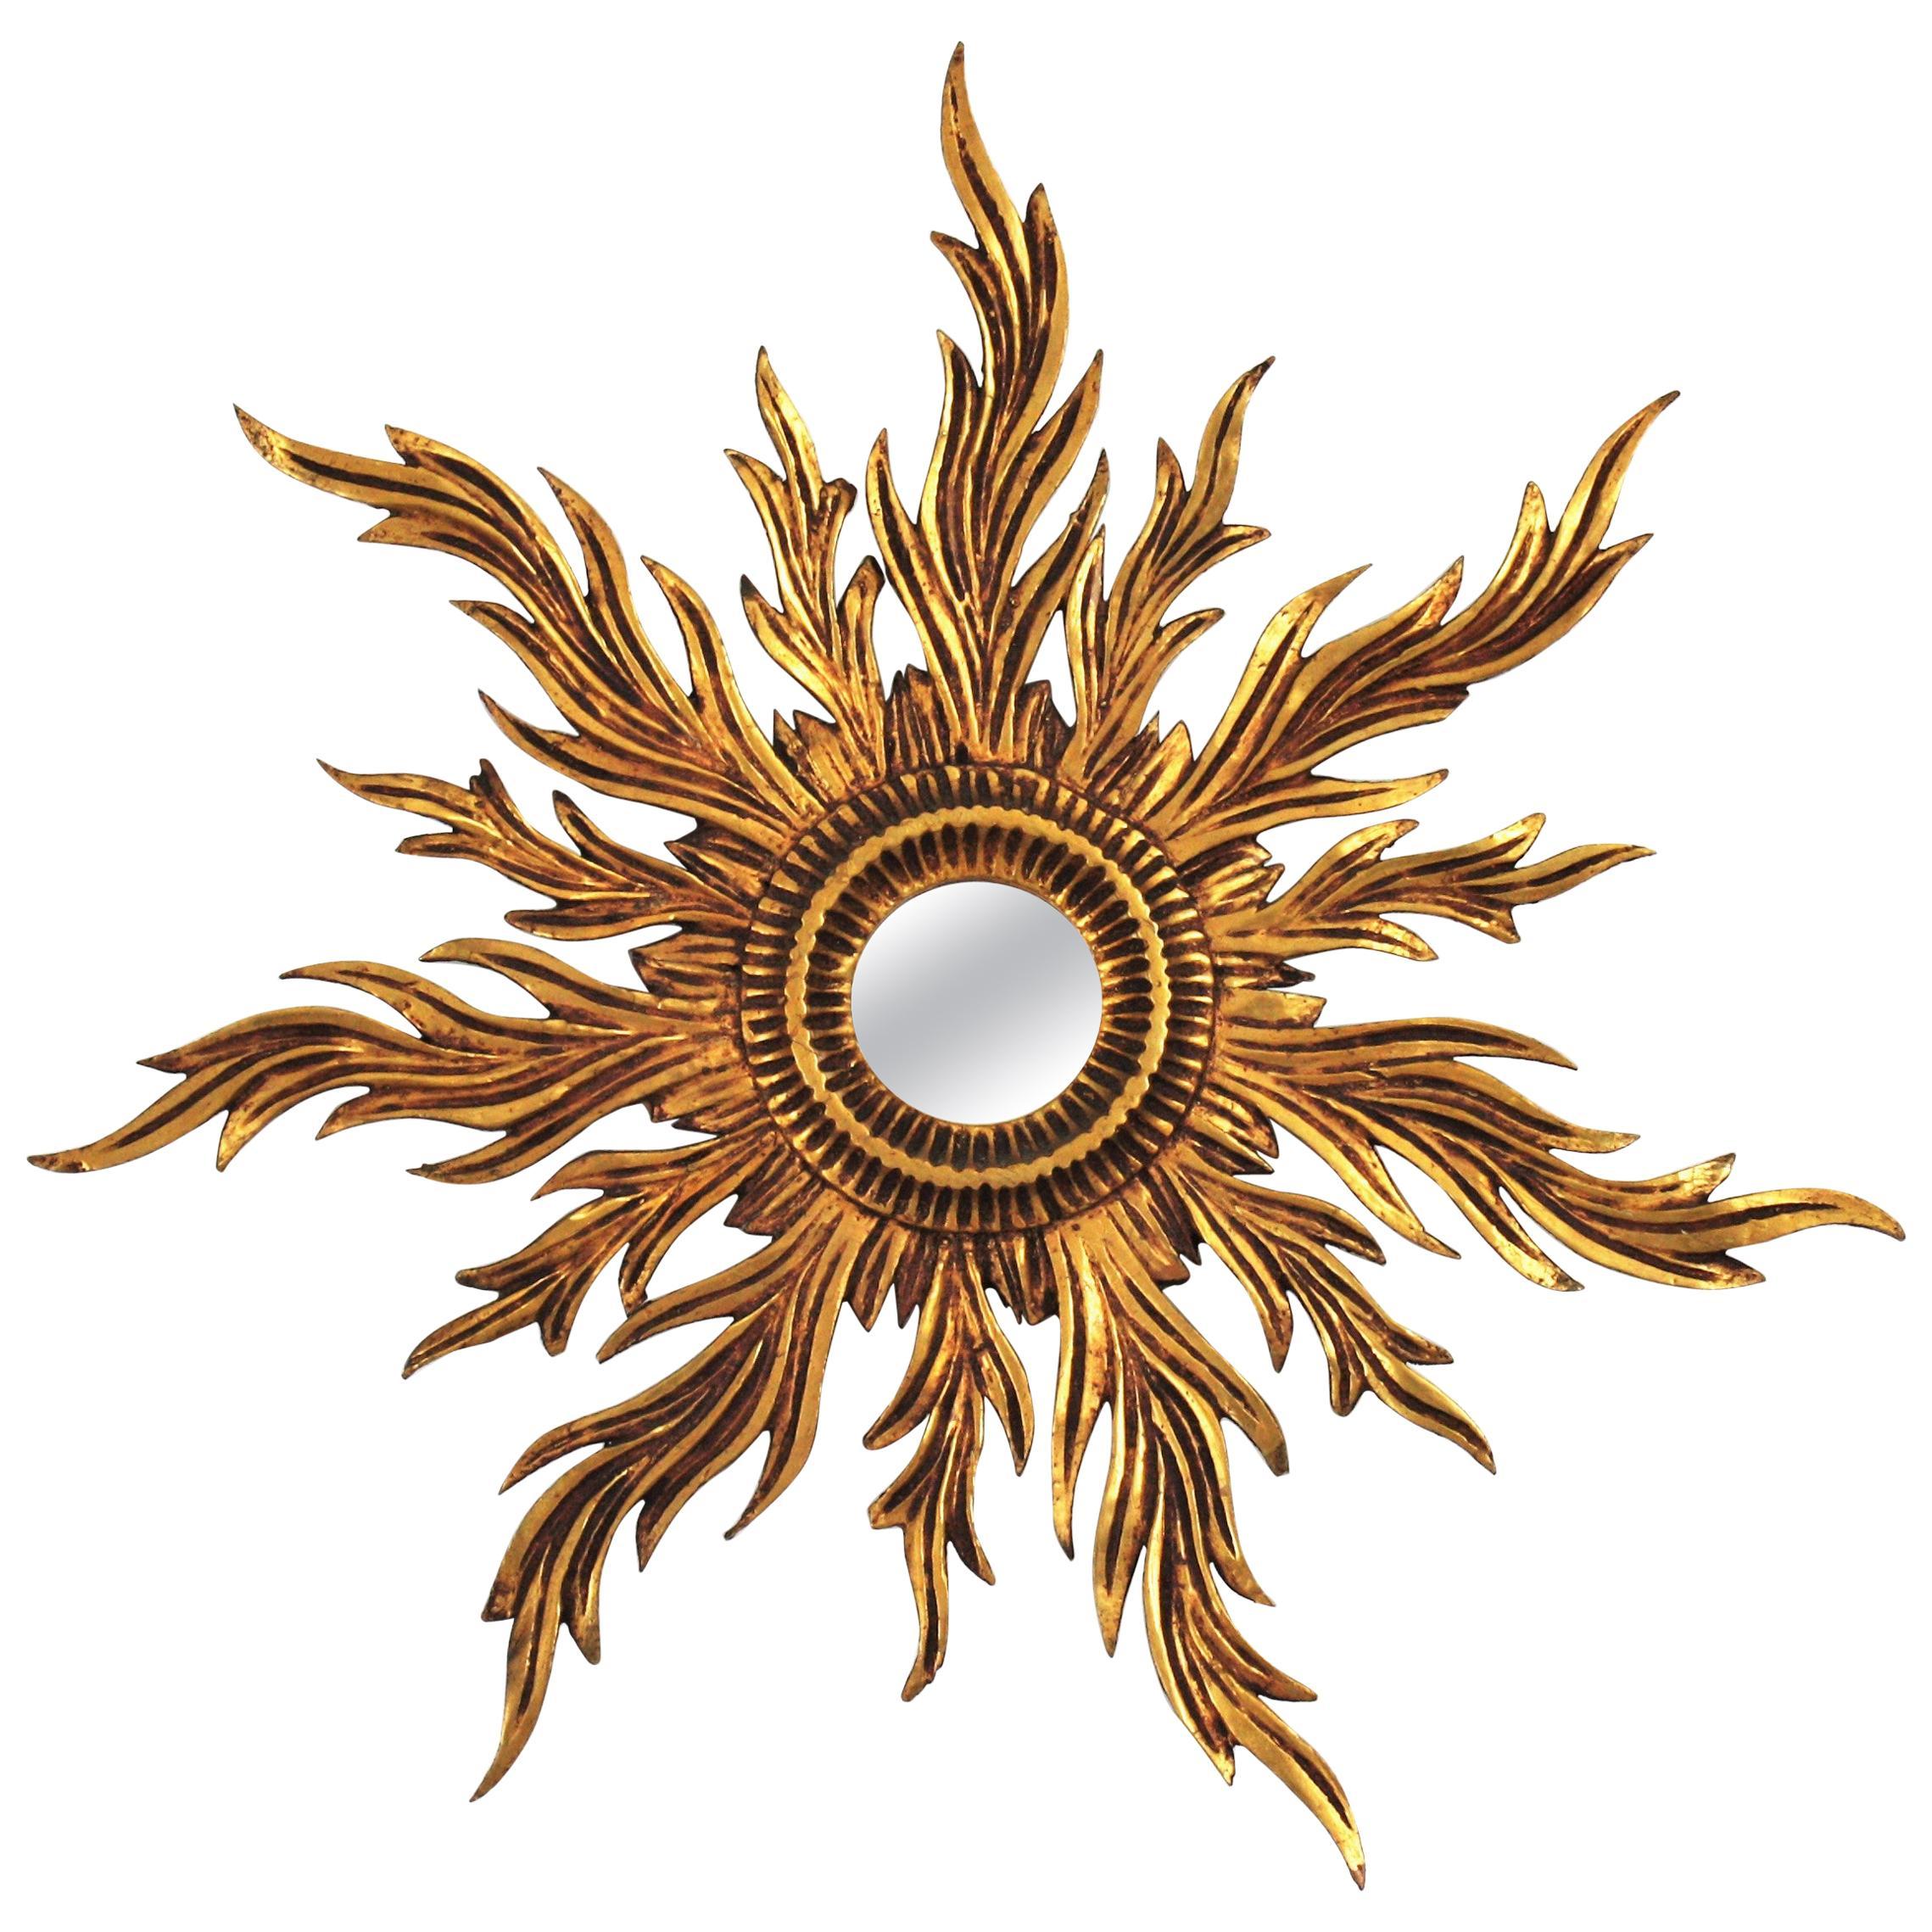 French Sunburst Giltwood Mirror, Early 20th Century